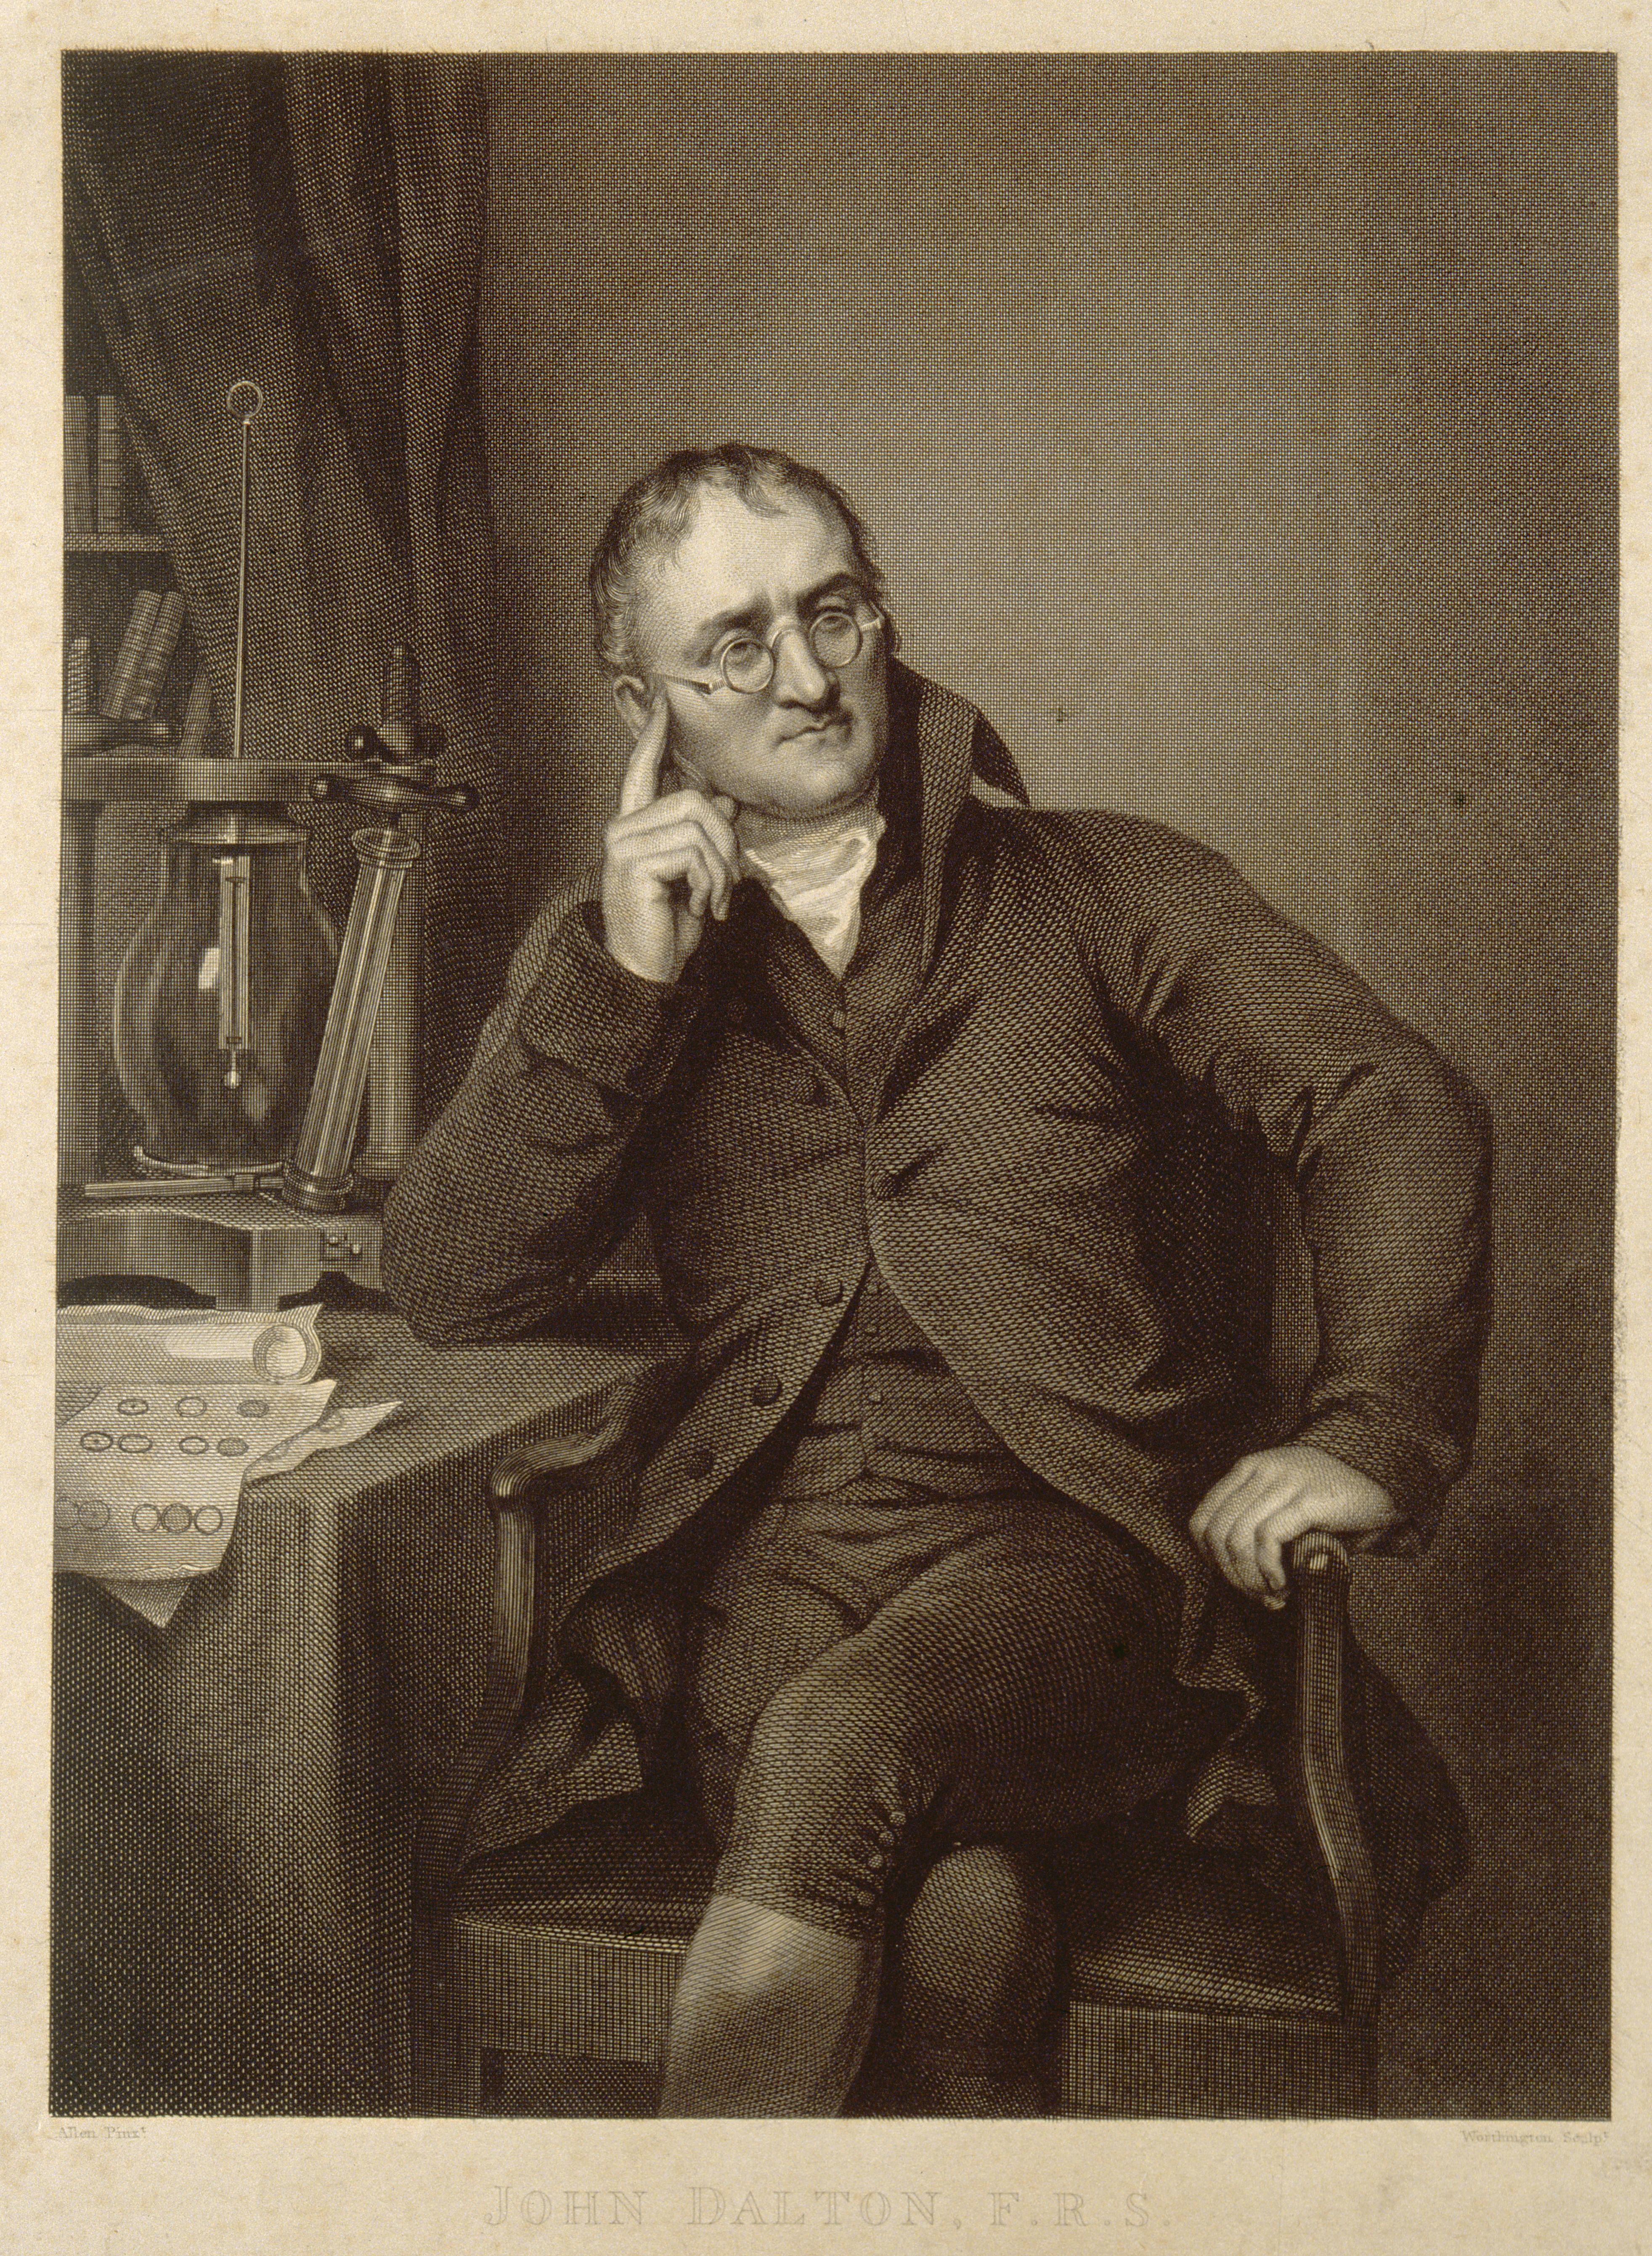 John Dalton Wikipedia